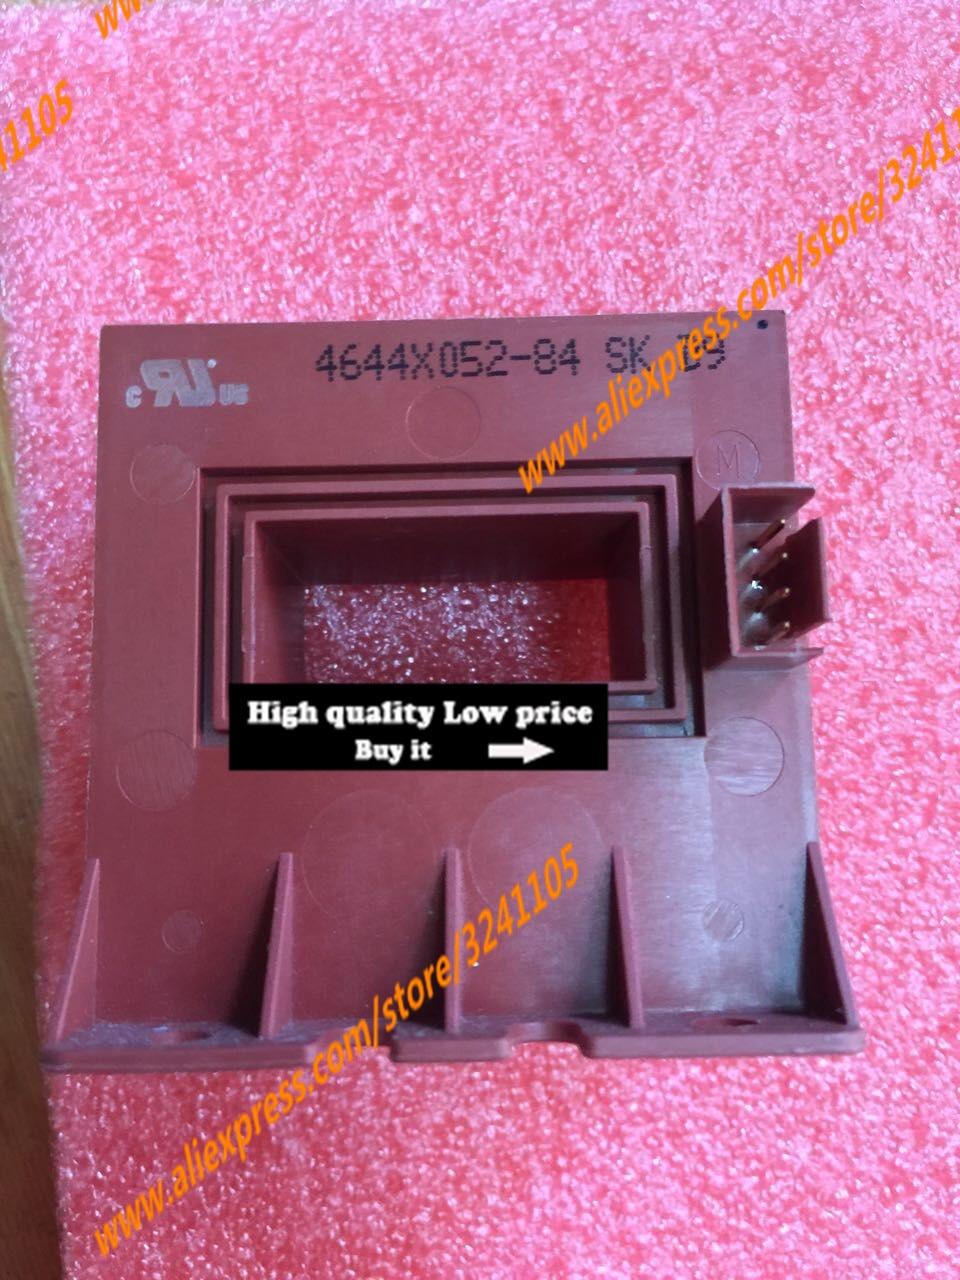 Free shipping NEW 4644X052-84 MODULE недорго, оригинальная цена